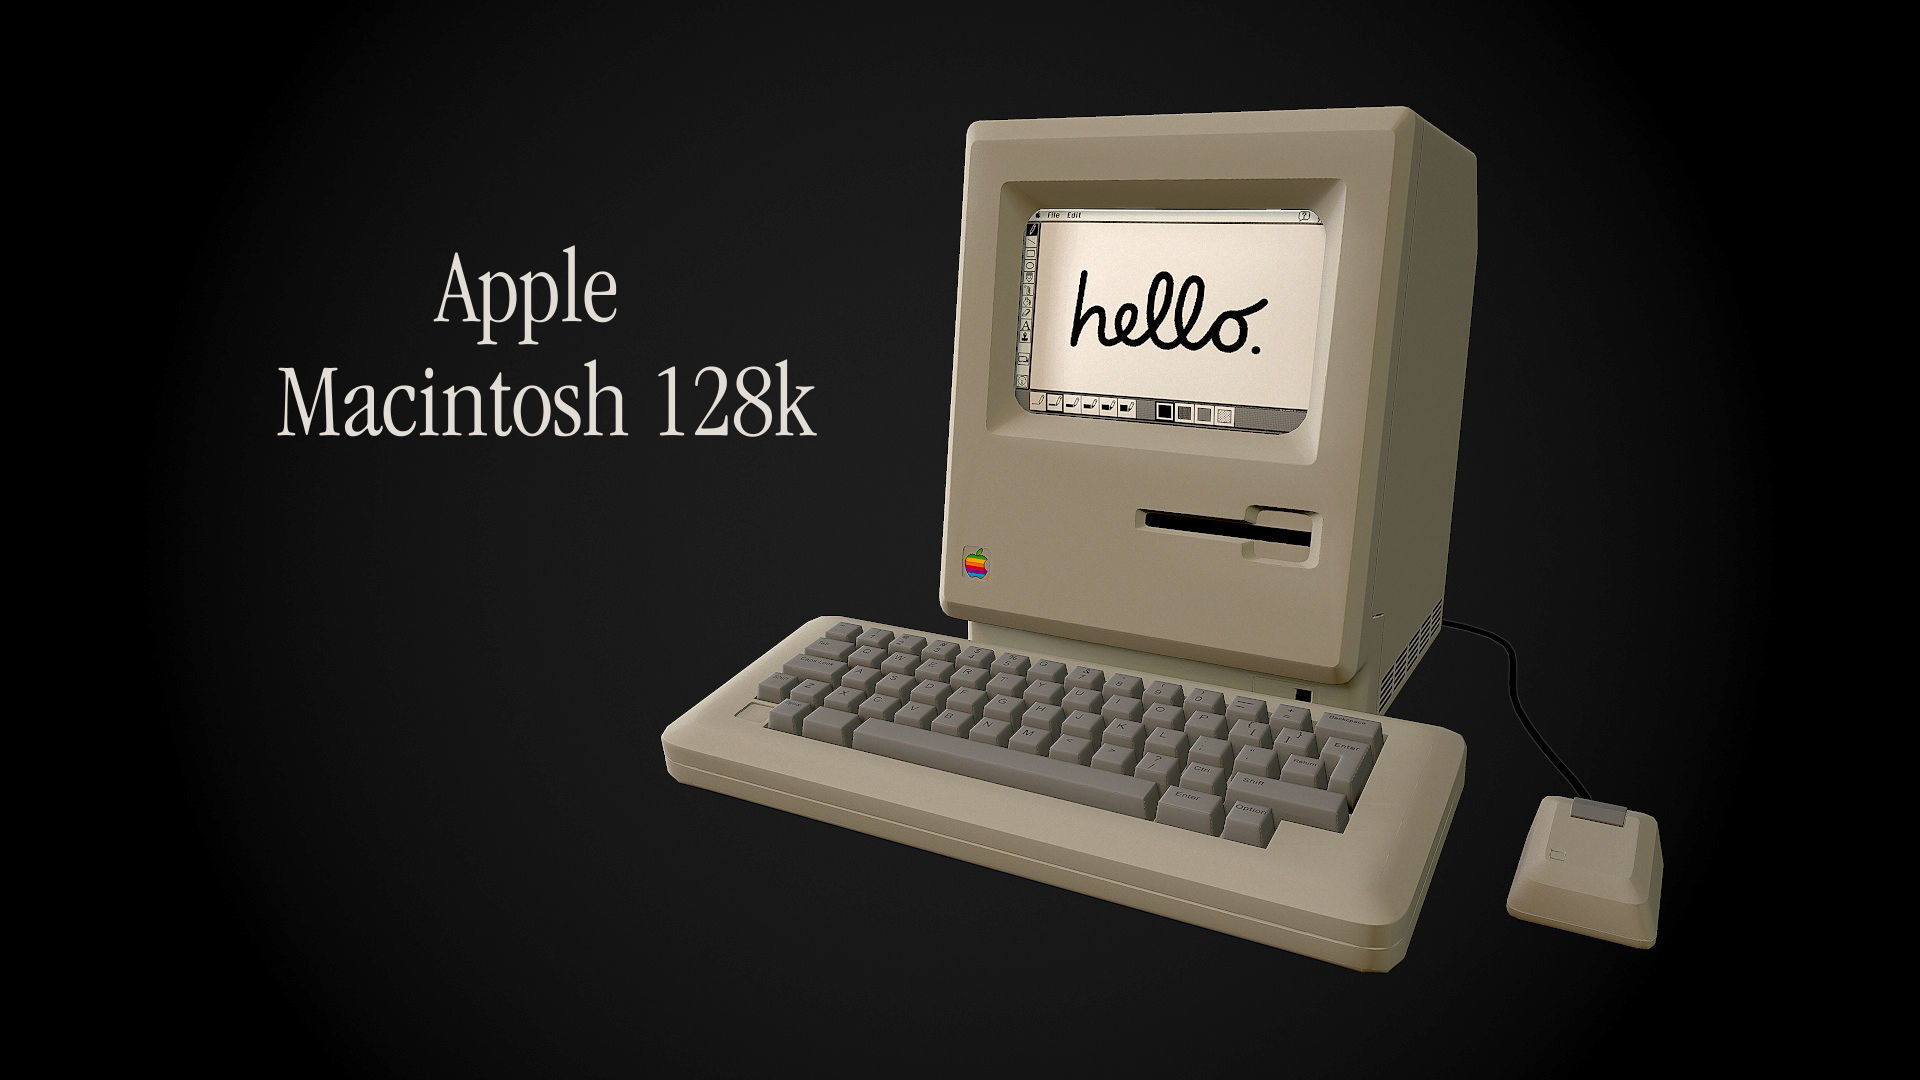 Apple Macintosh 128k retro computer